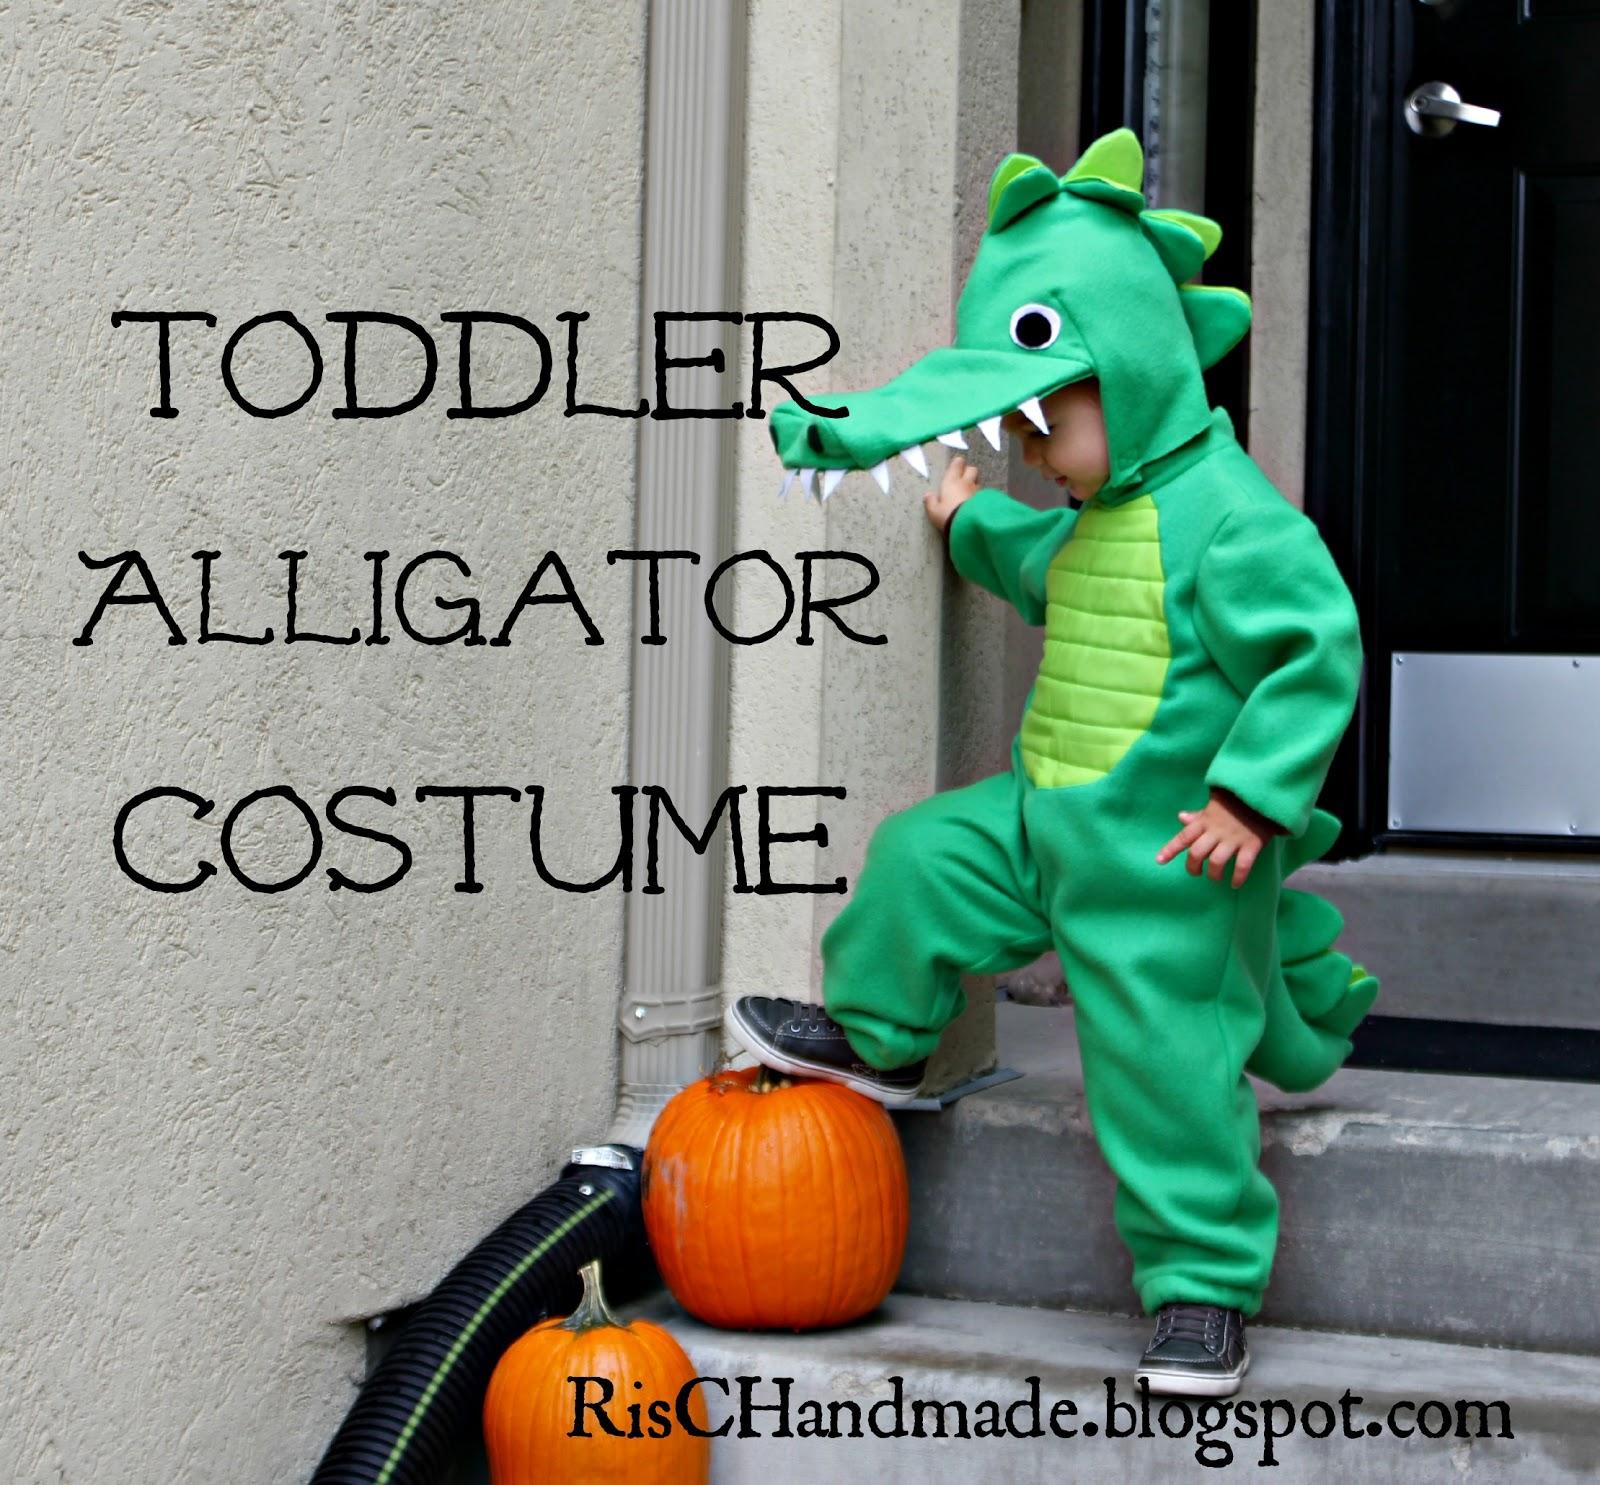 Risc Handmade Toddler Alligator Costume